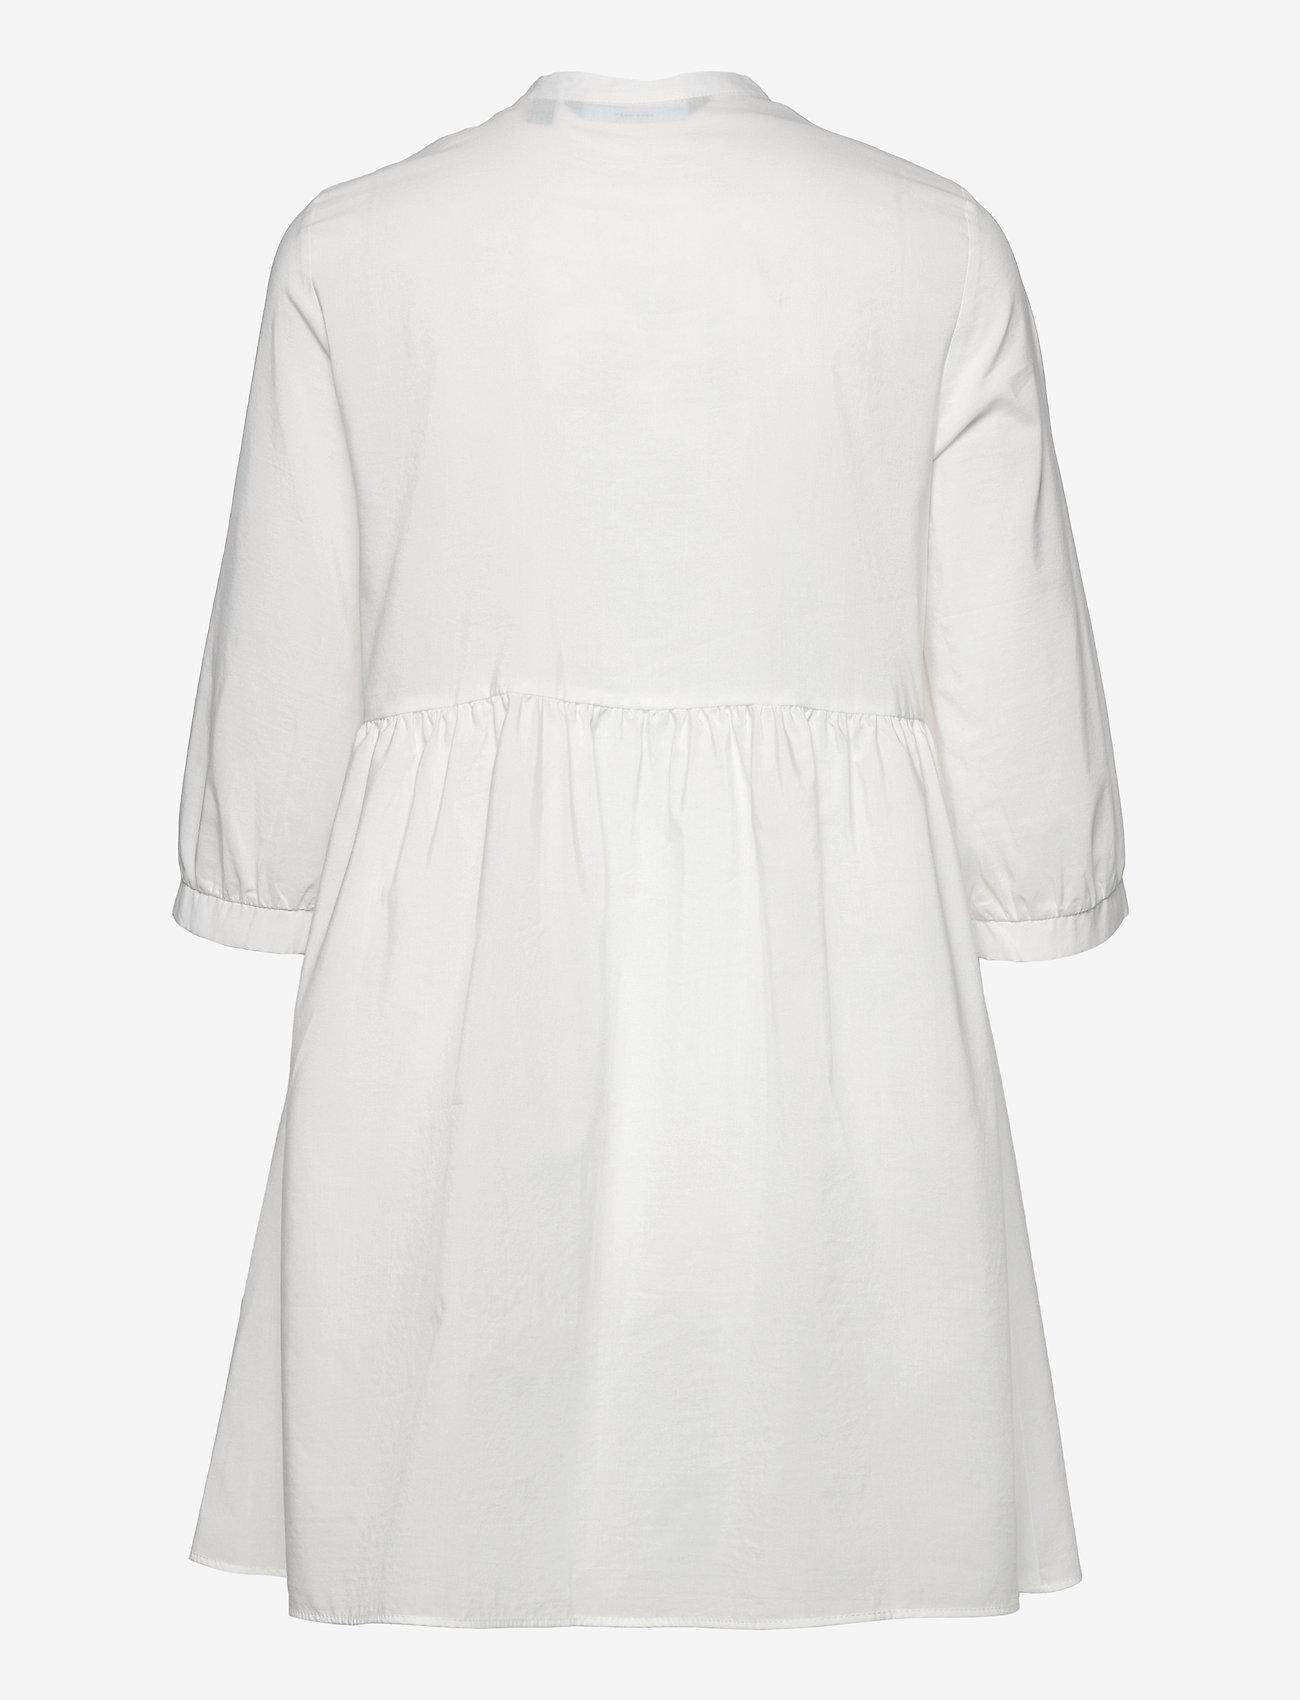 Vero Moda - VMSISI 3/4 DRESS - sommarklänningar - snow white - 1